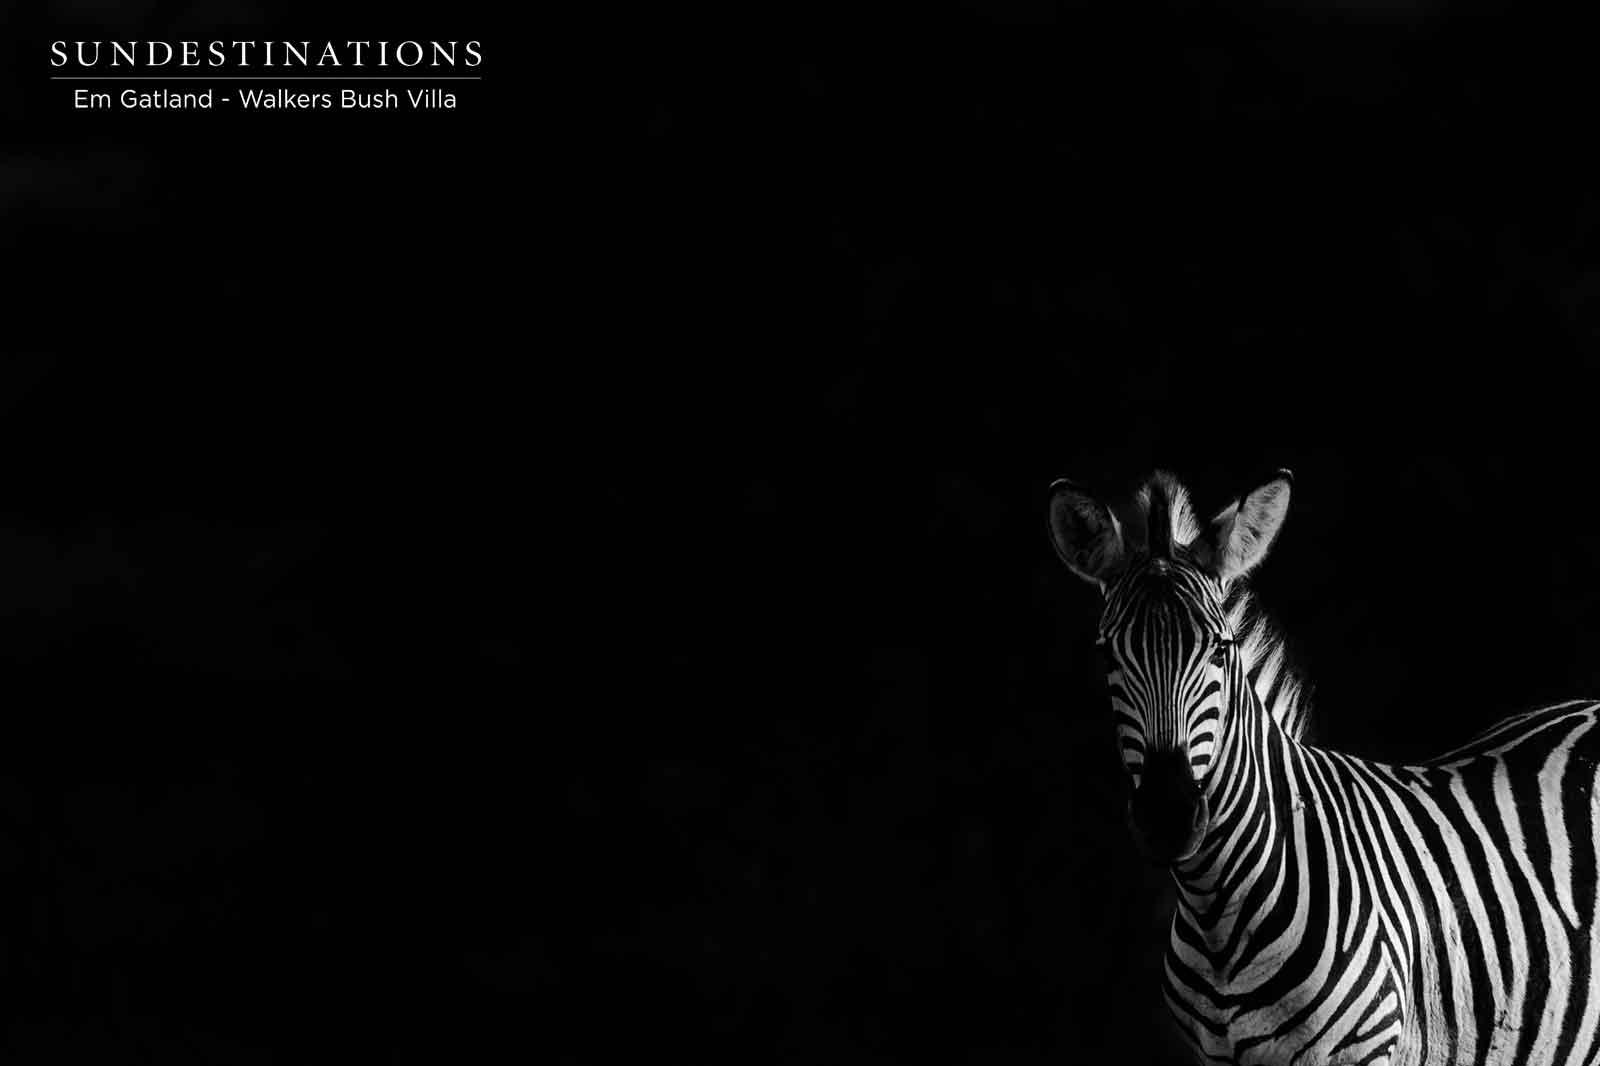 Zebra at Walkers Bush Vlla